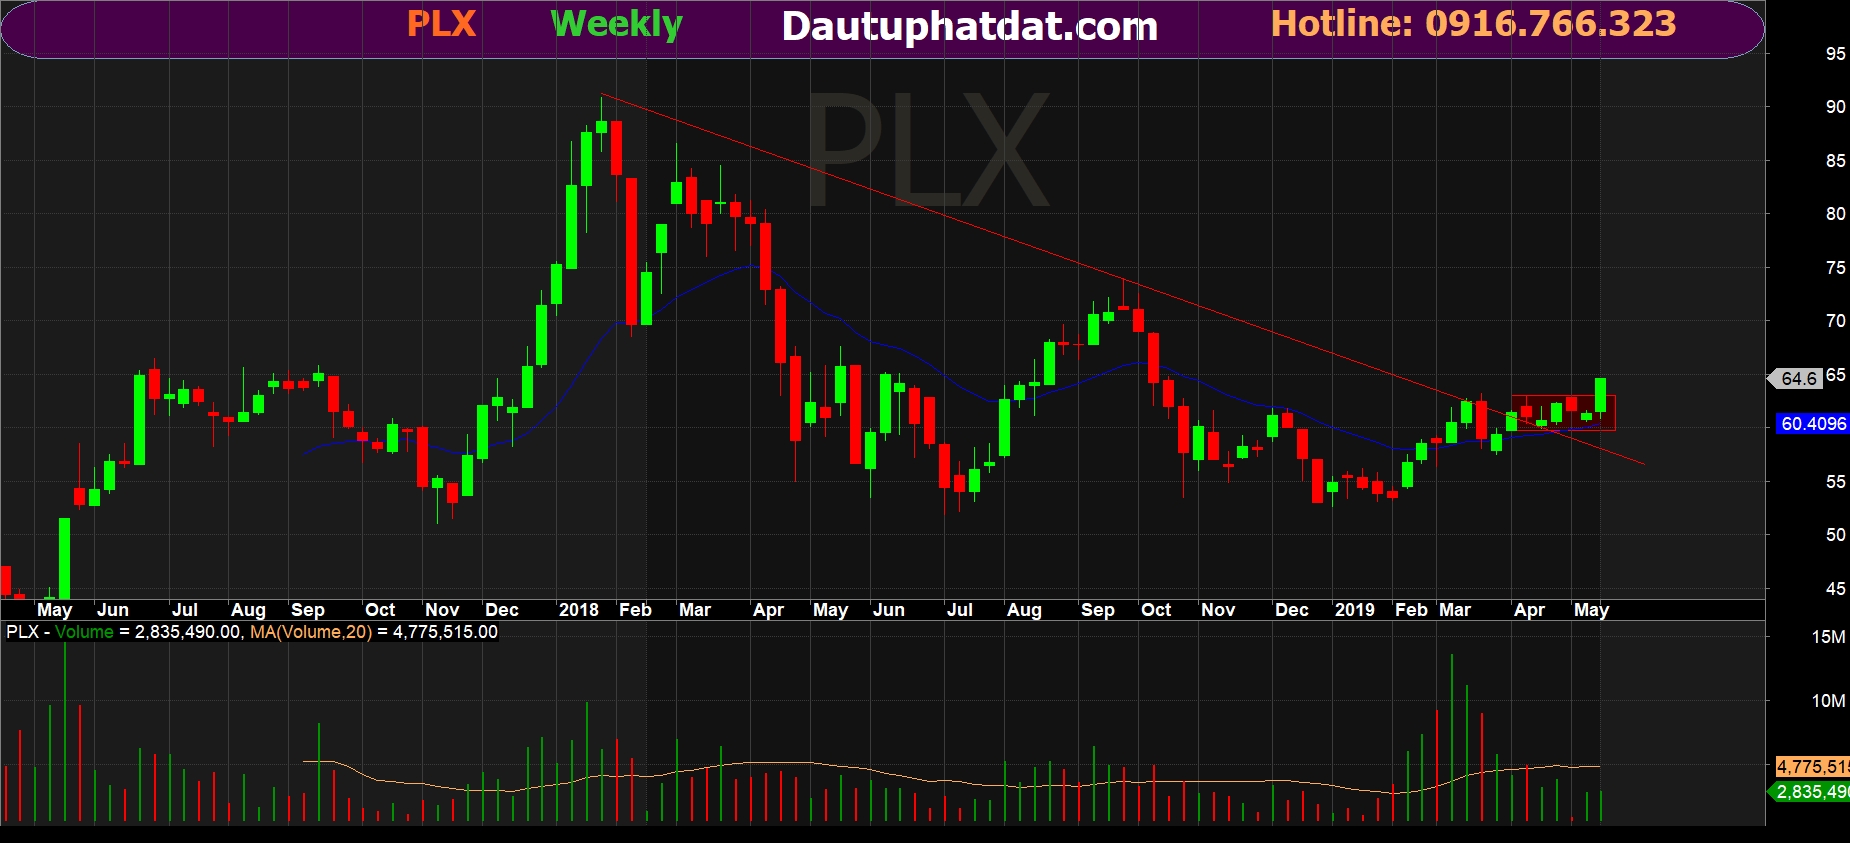 PLX week